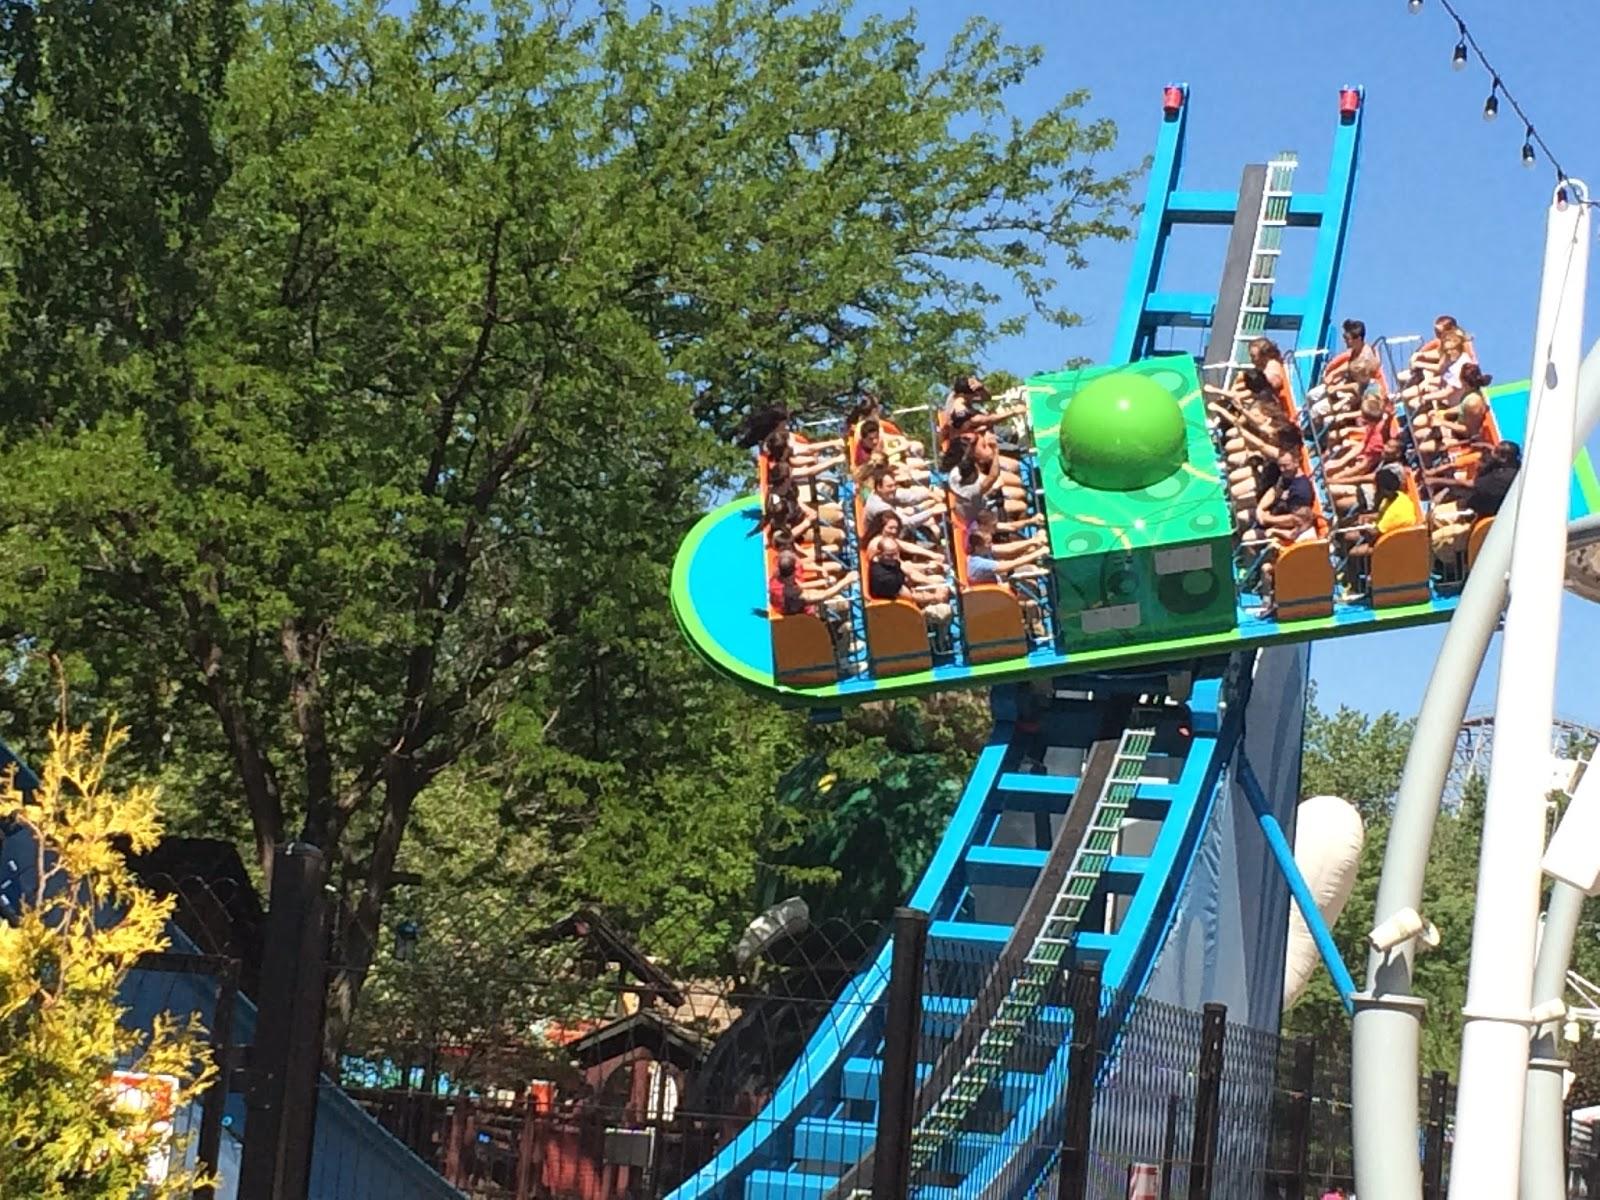 Pipe Scream Cedar Point